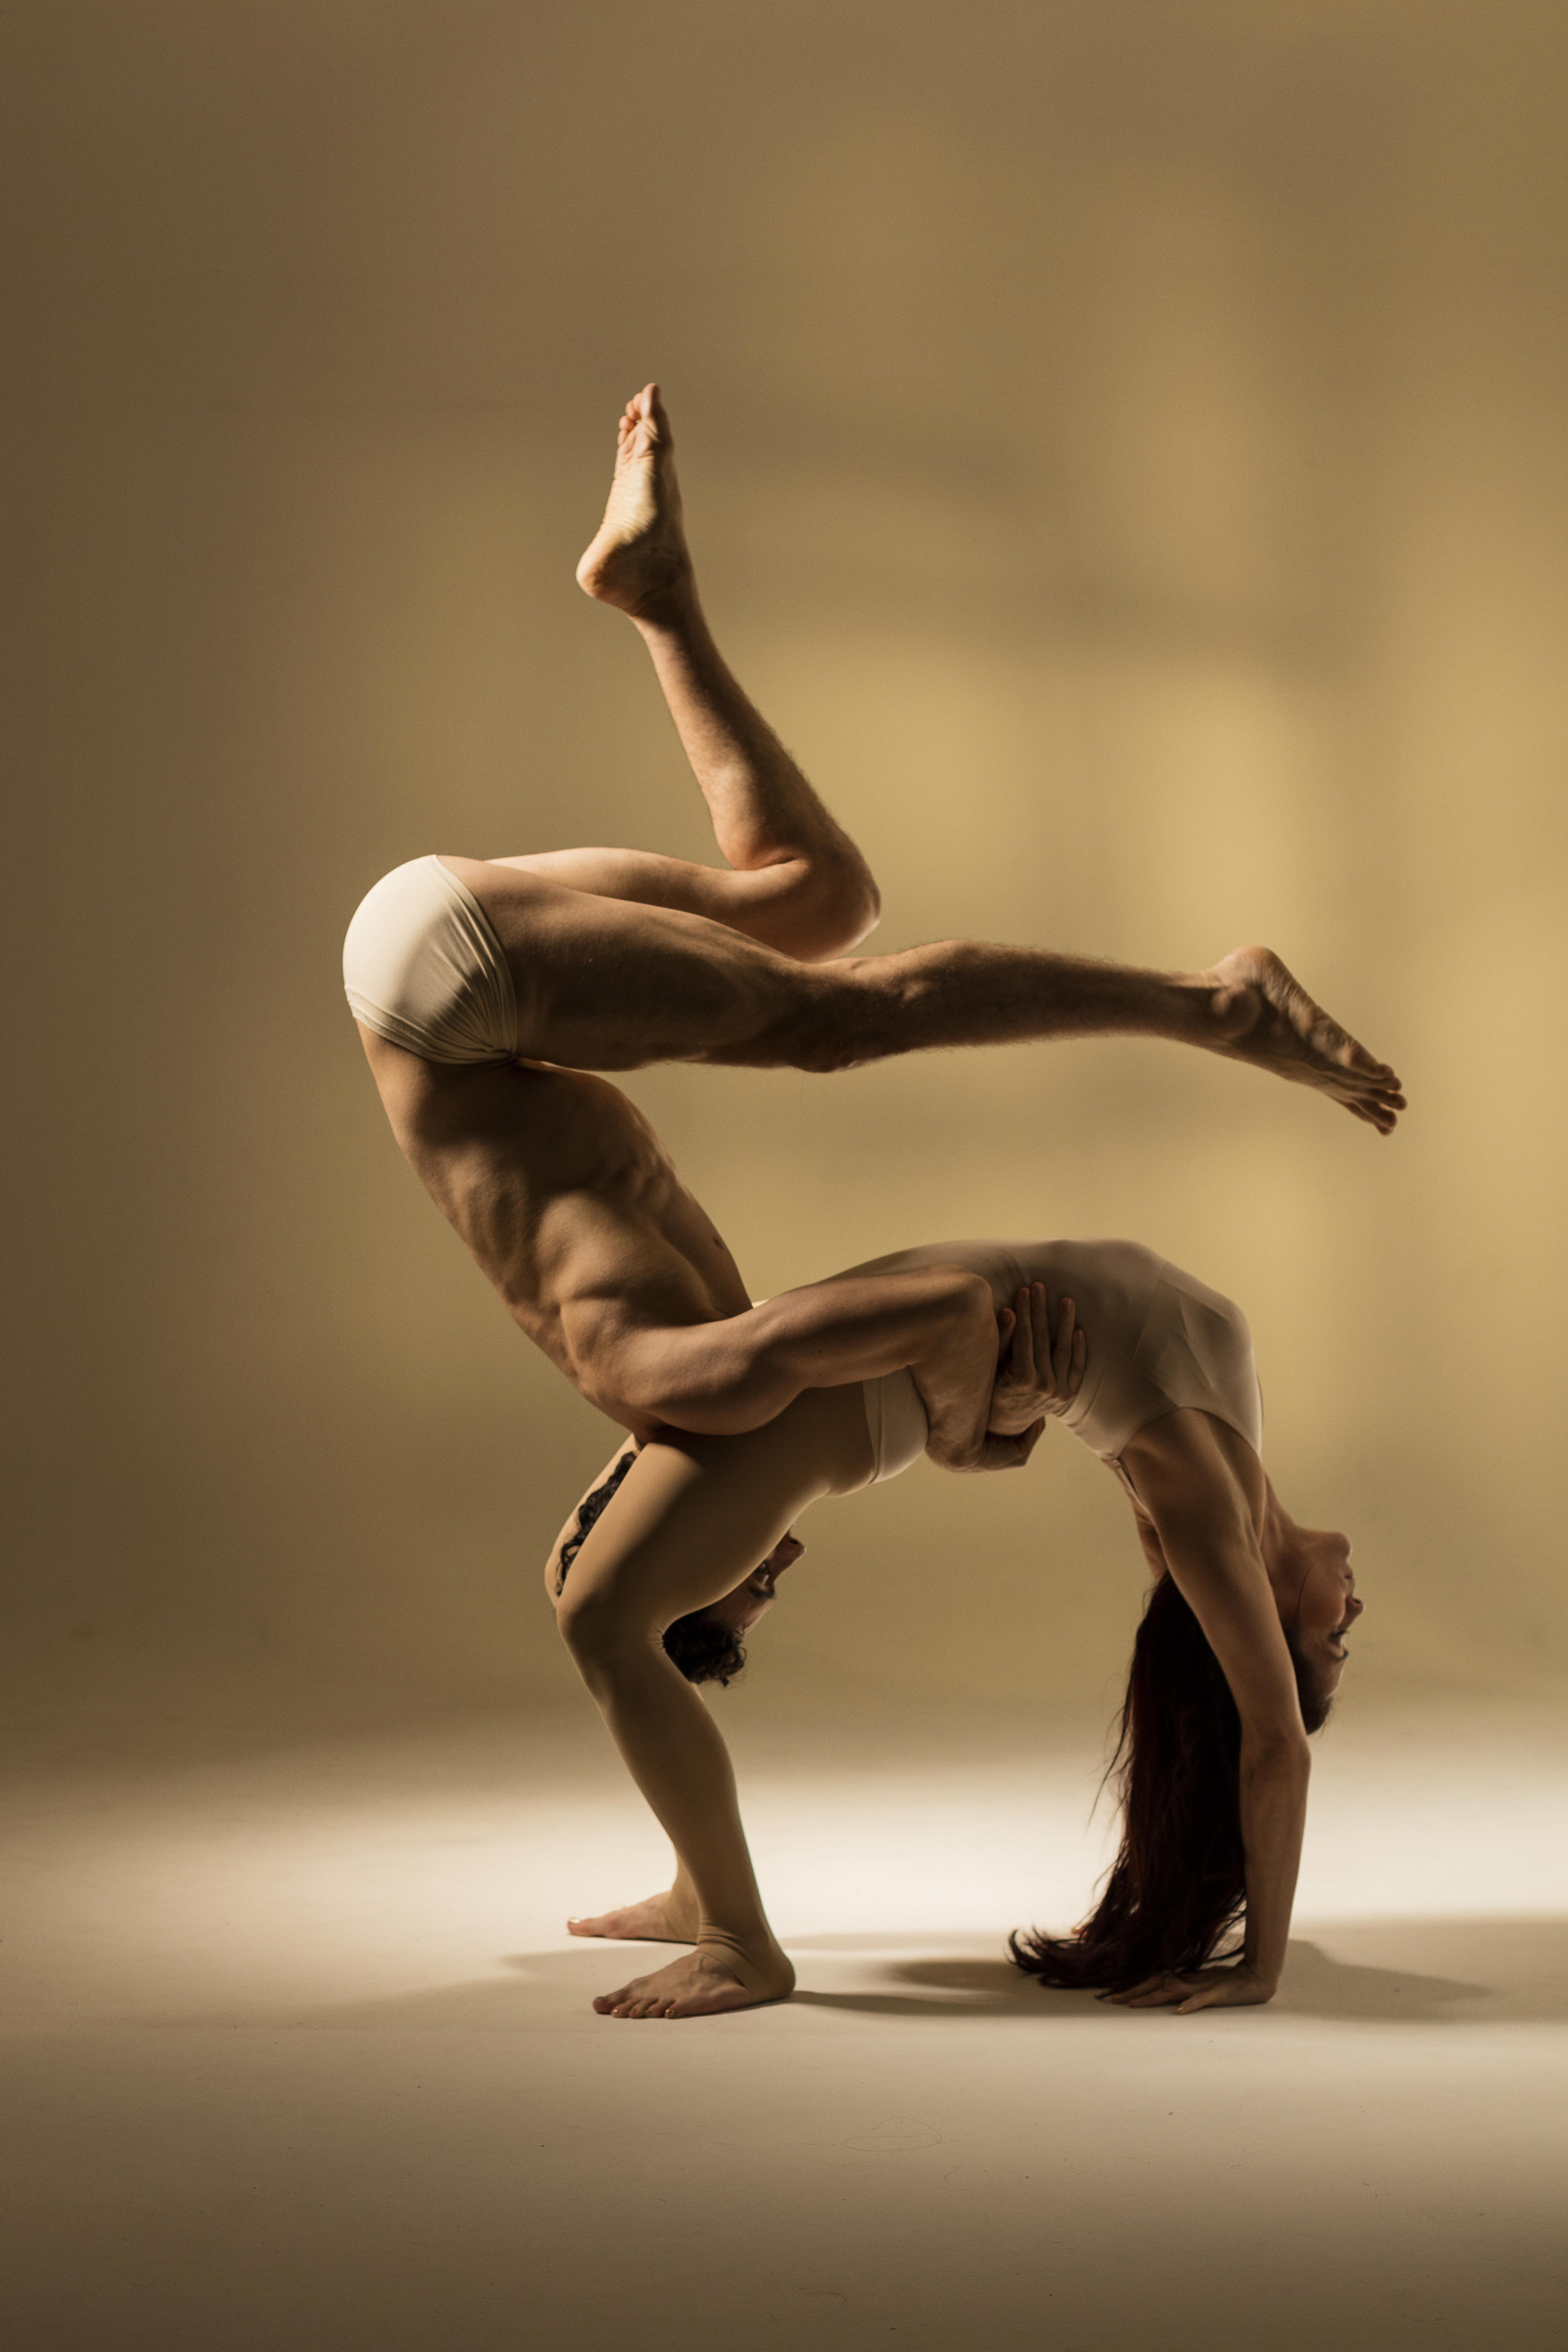 Acrobatic dance duo